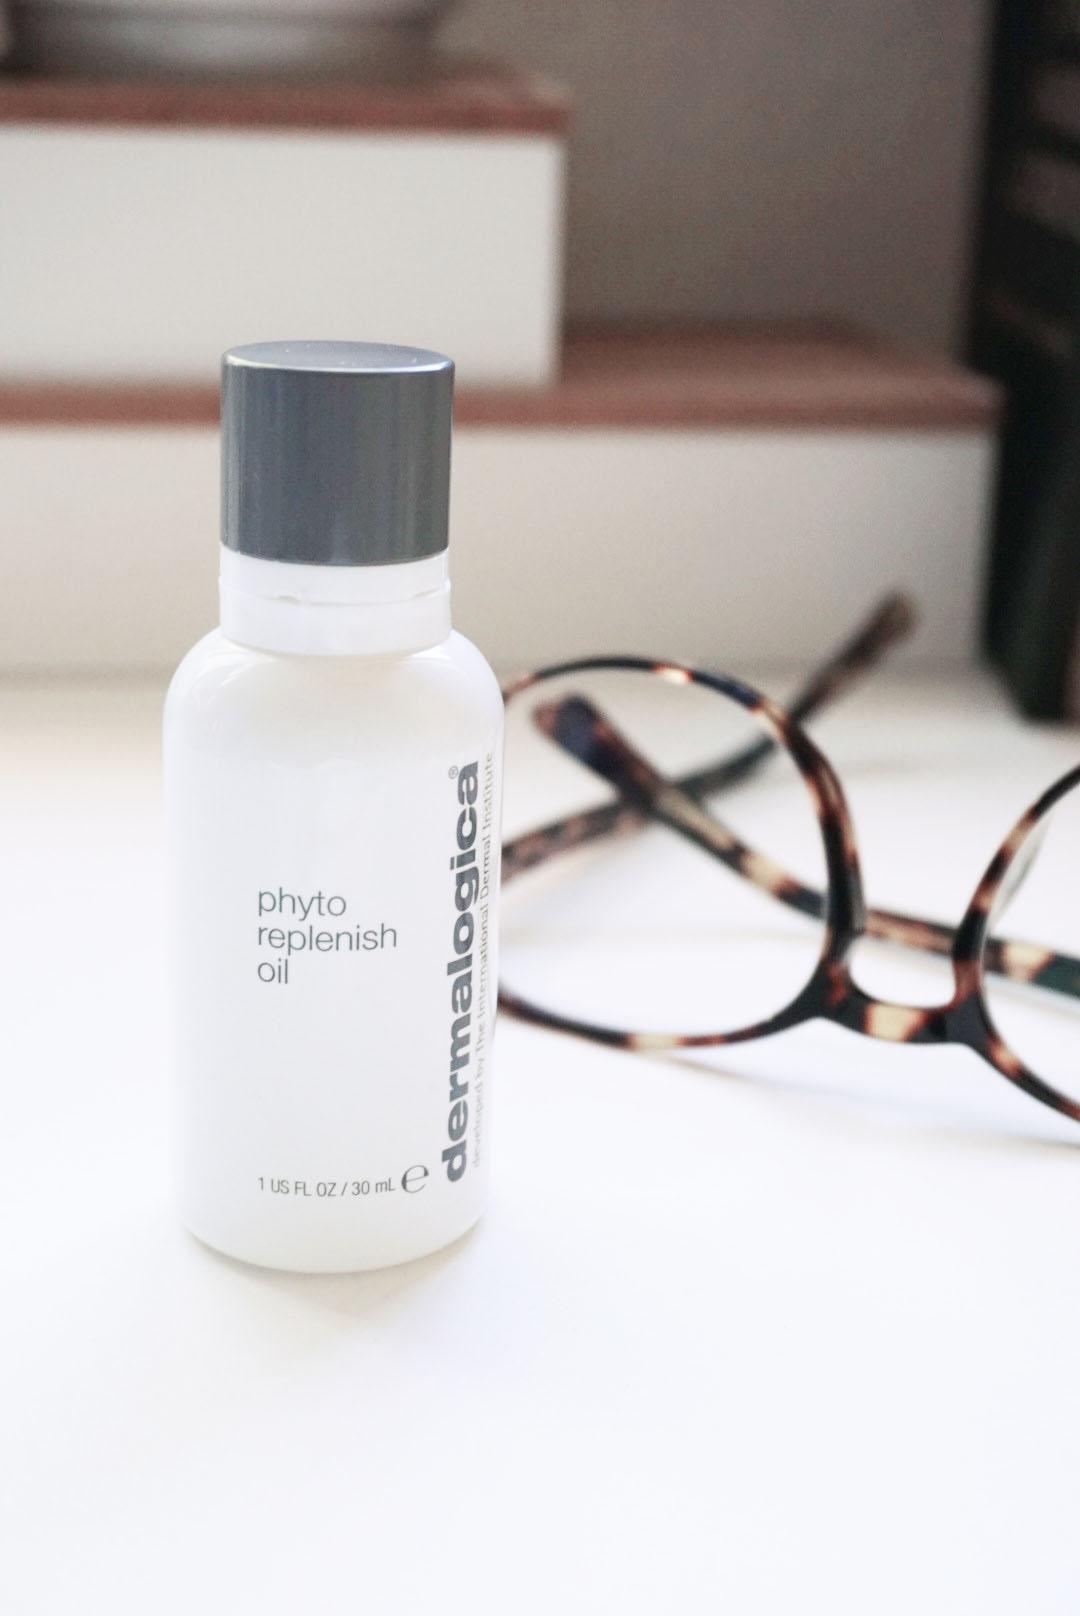 Dermalogica-Phyto-Replenish-Oil